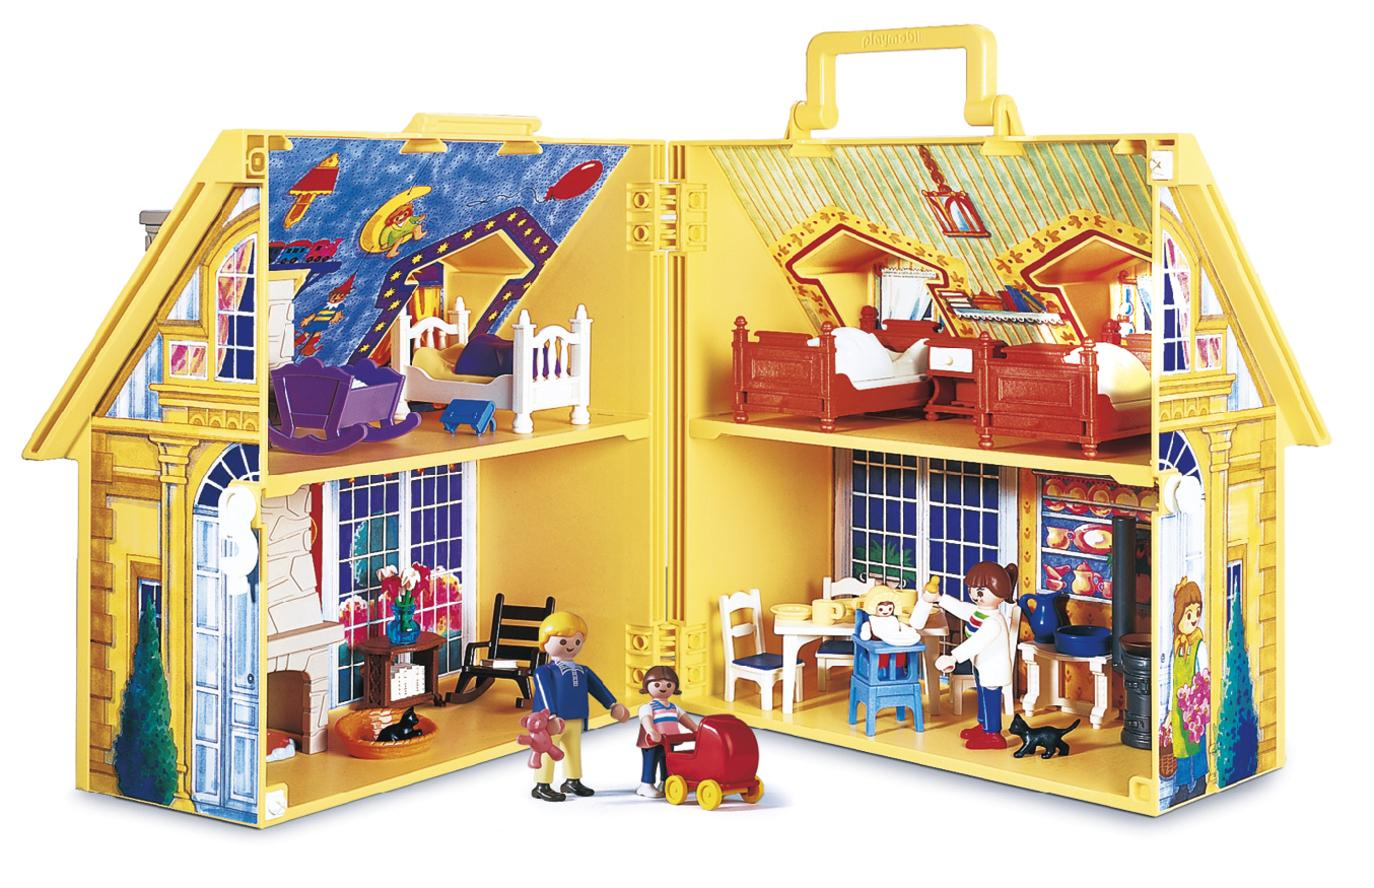 Foto playmobil 4255 tesoro castillo encantado foto 263217 - Gran casa de munecas playmobil ...